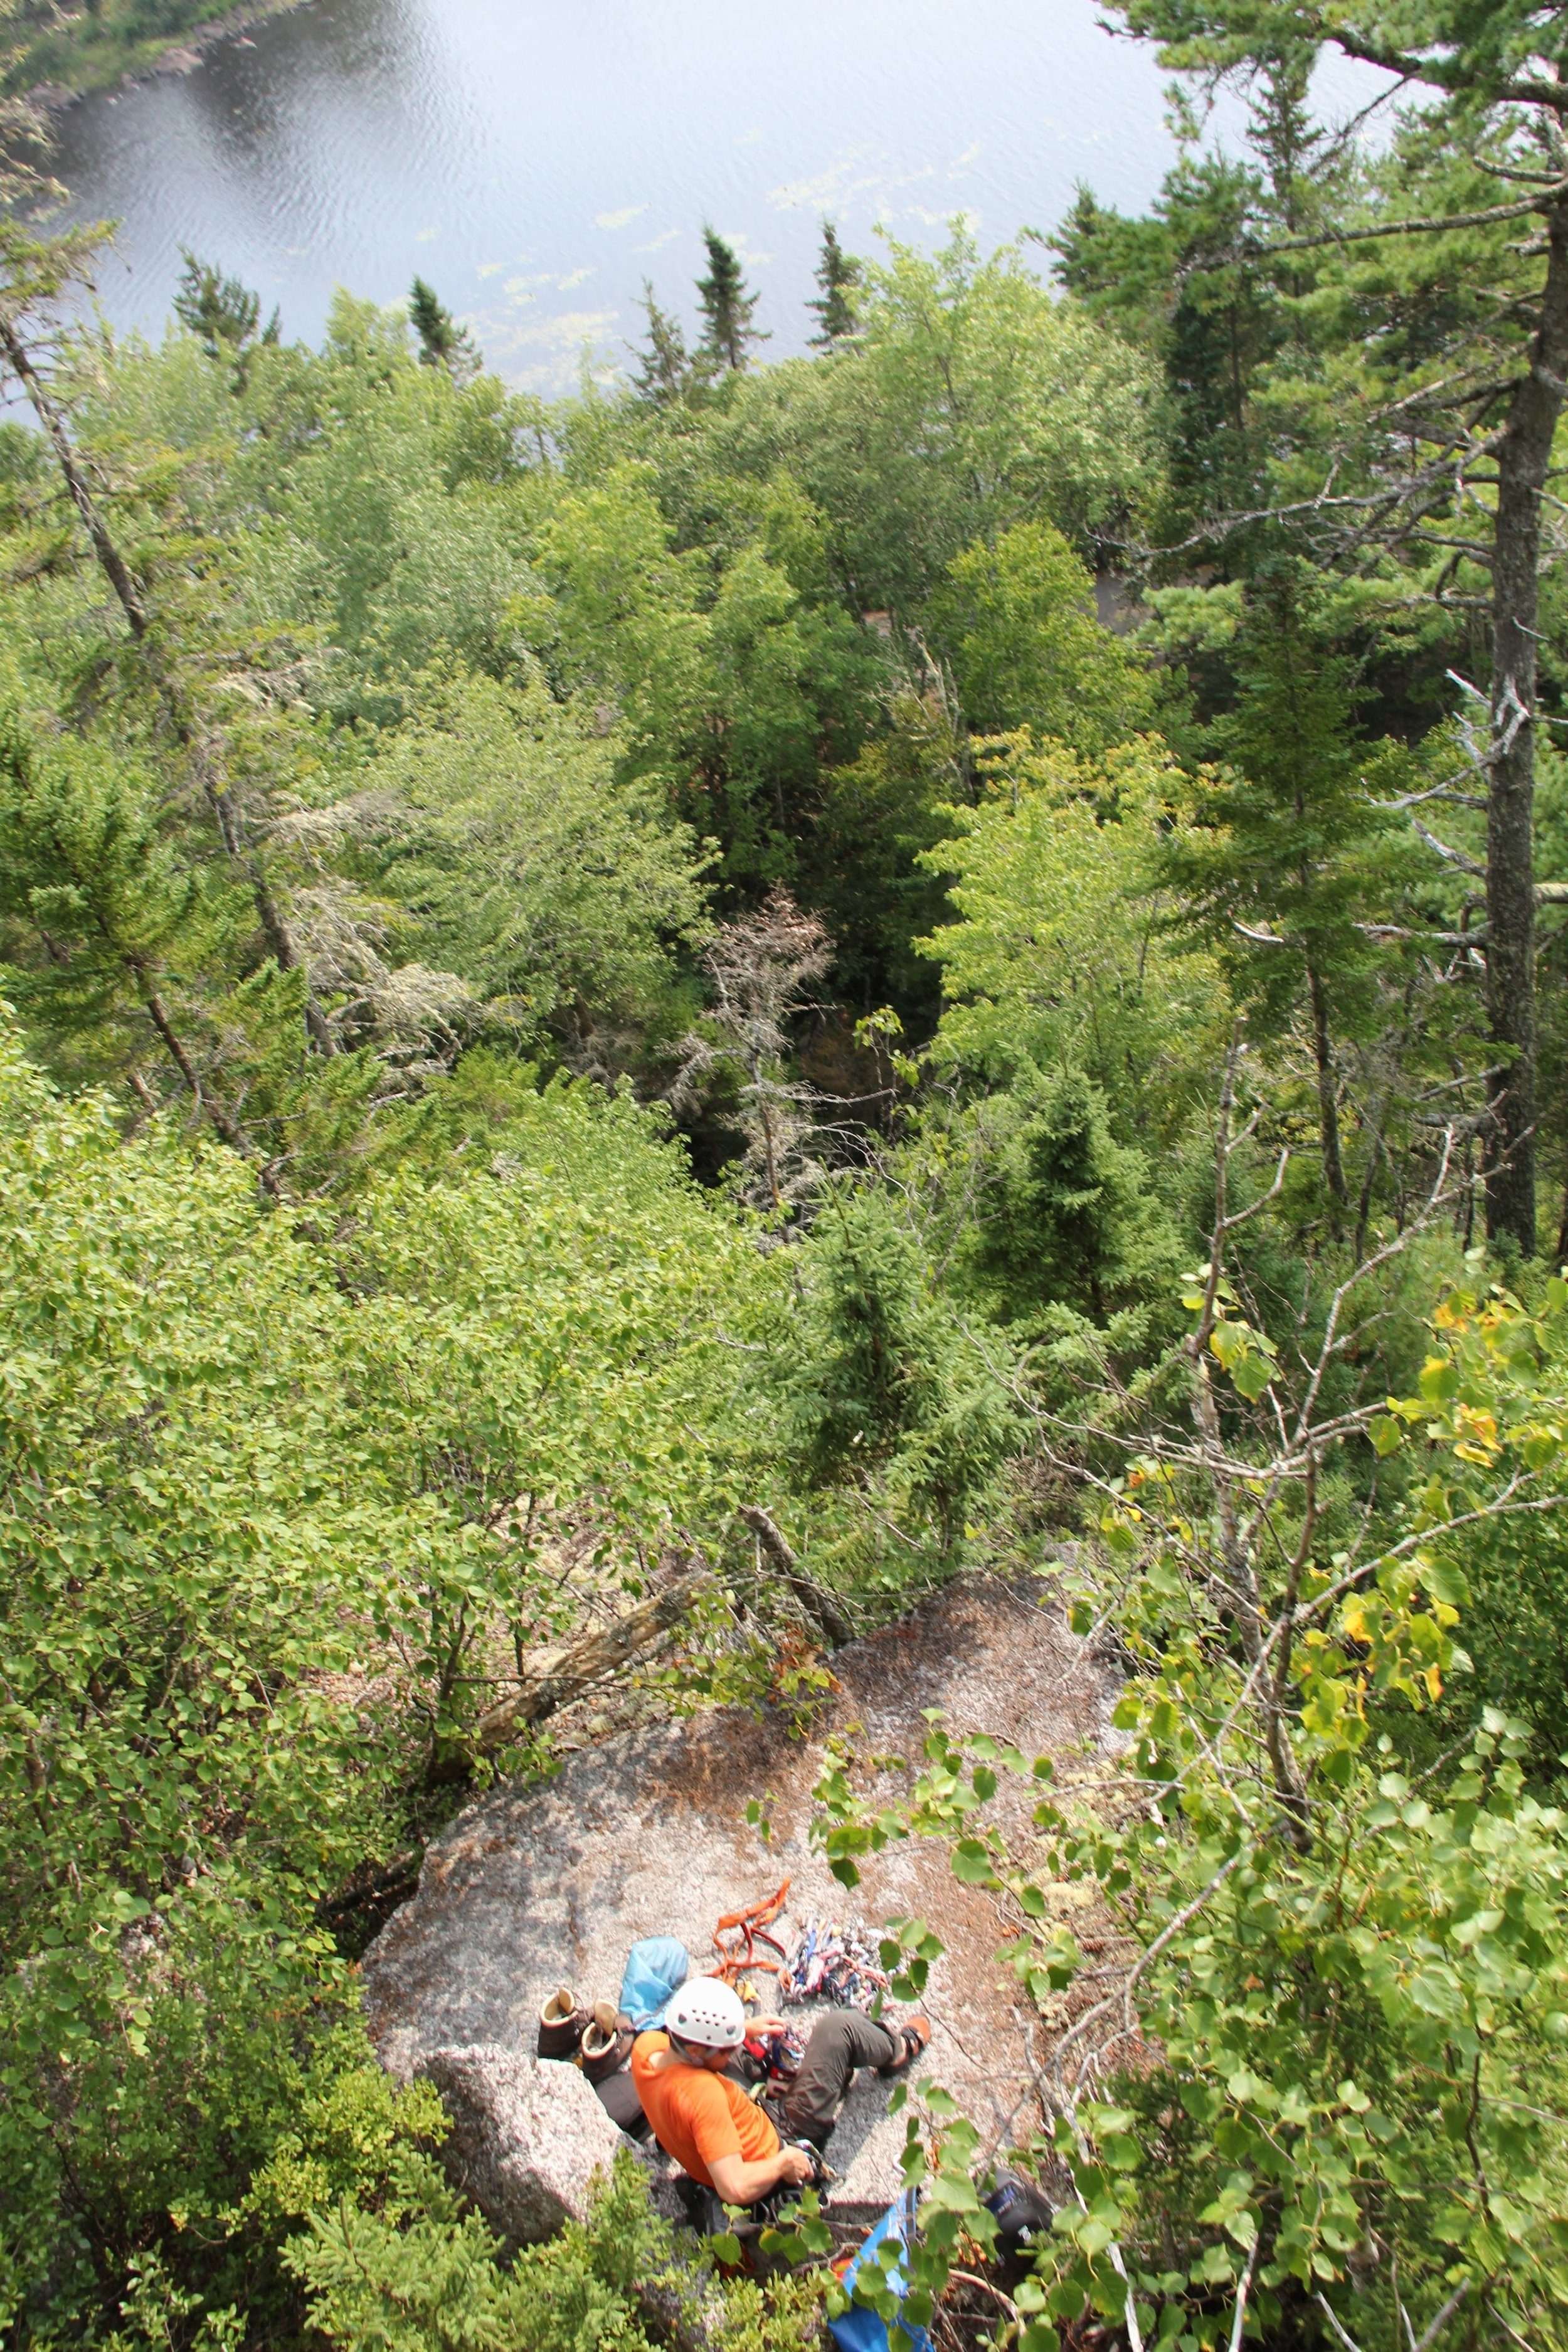 Belay platform the bottom of the crag